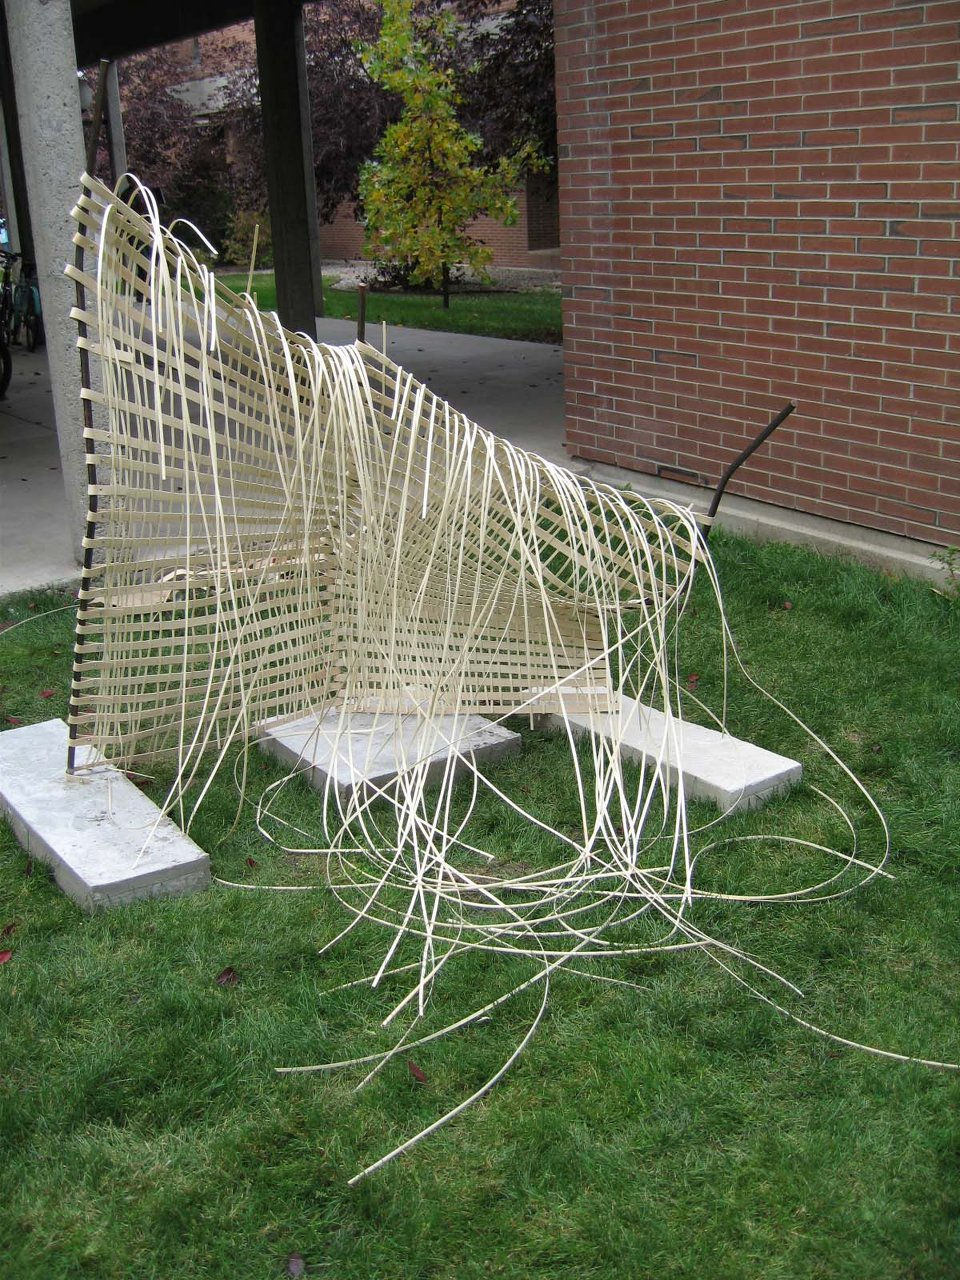 The Weaving Process